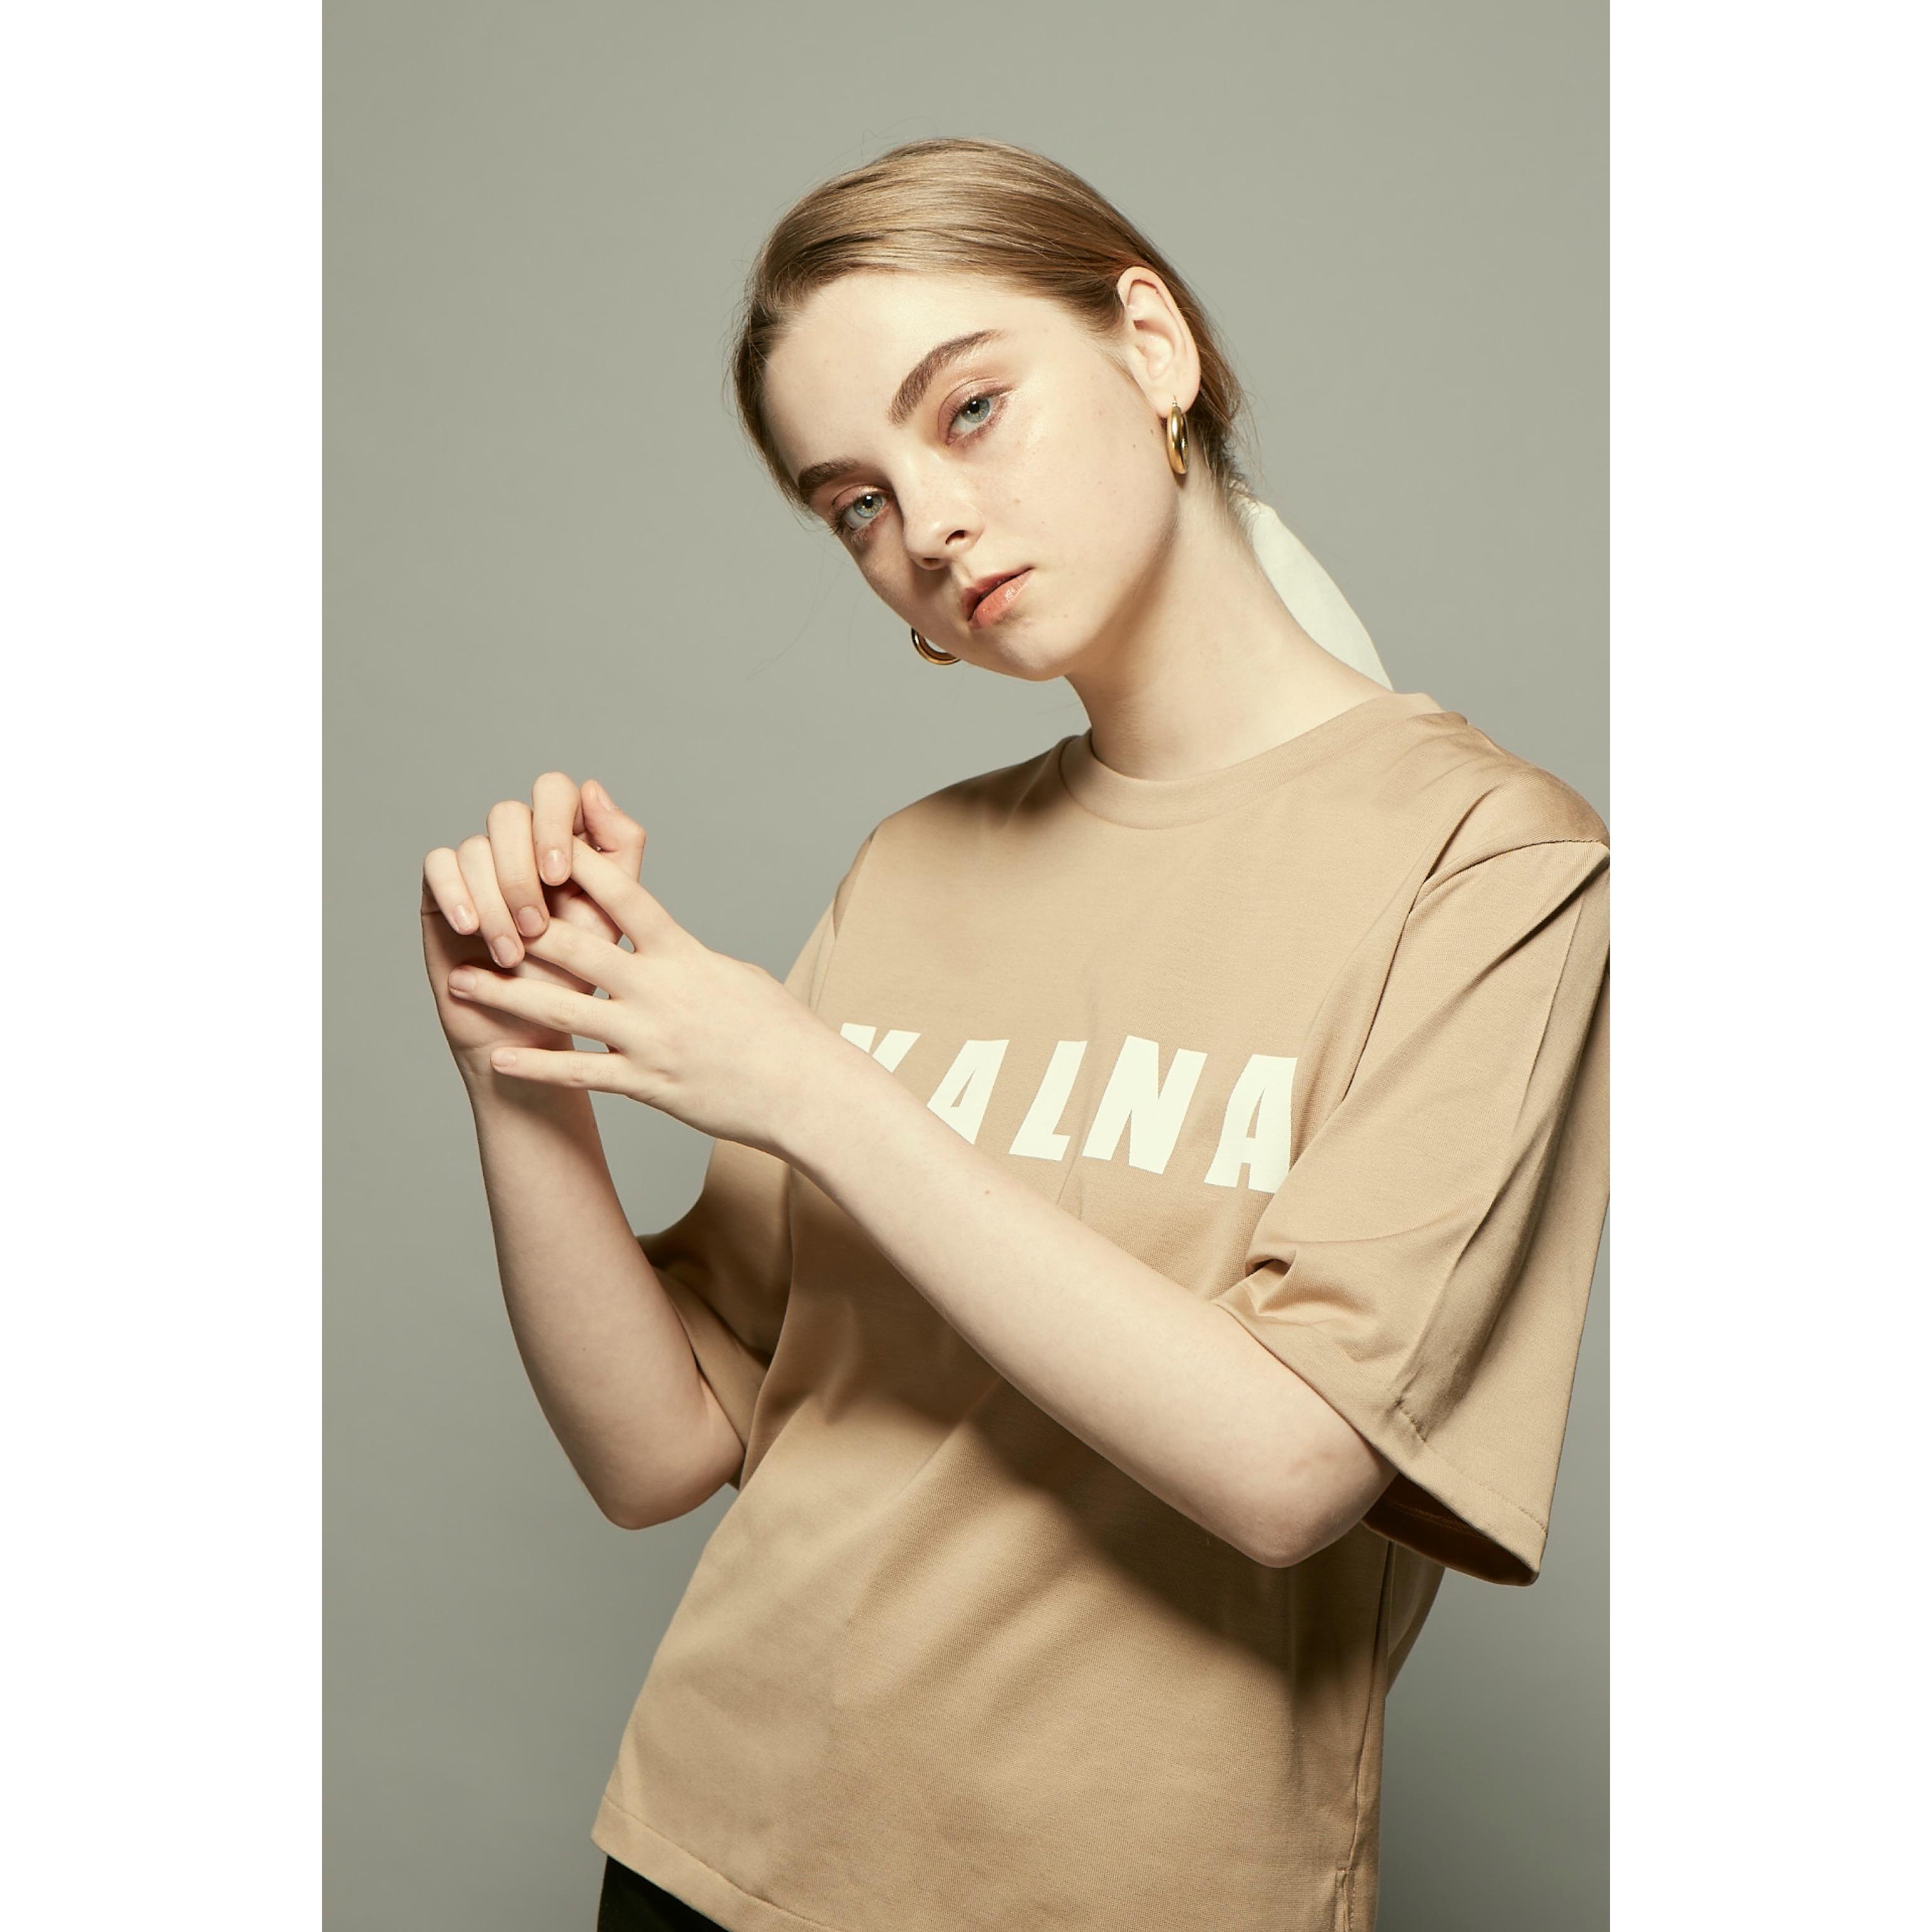 Kalna printed T-shirt 再入荷のお知らせ